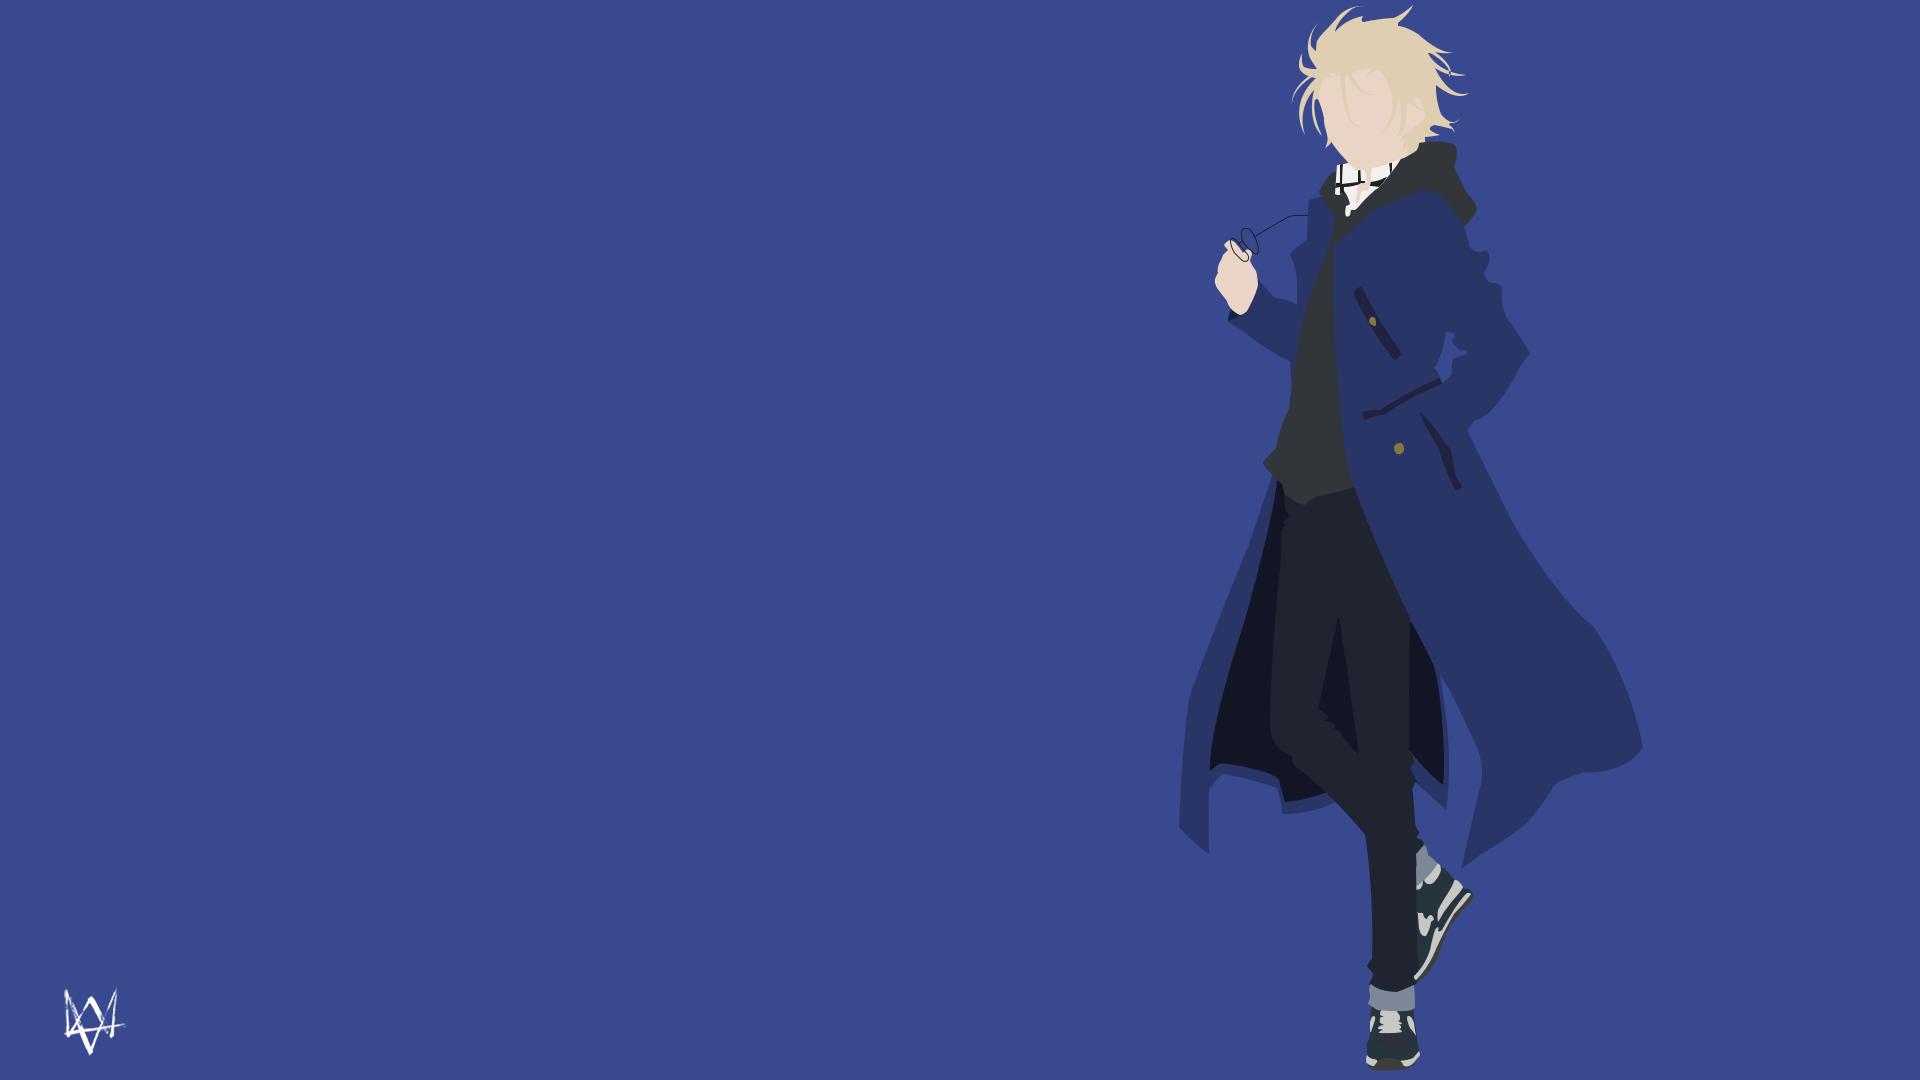 Black (Kekkai Sensen) Minimalist by Lucifer012 on DeviantArt